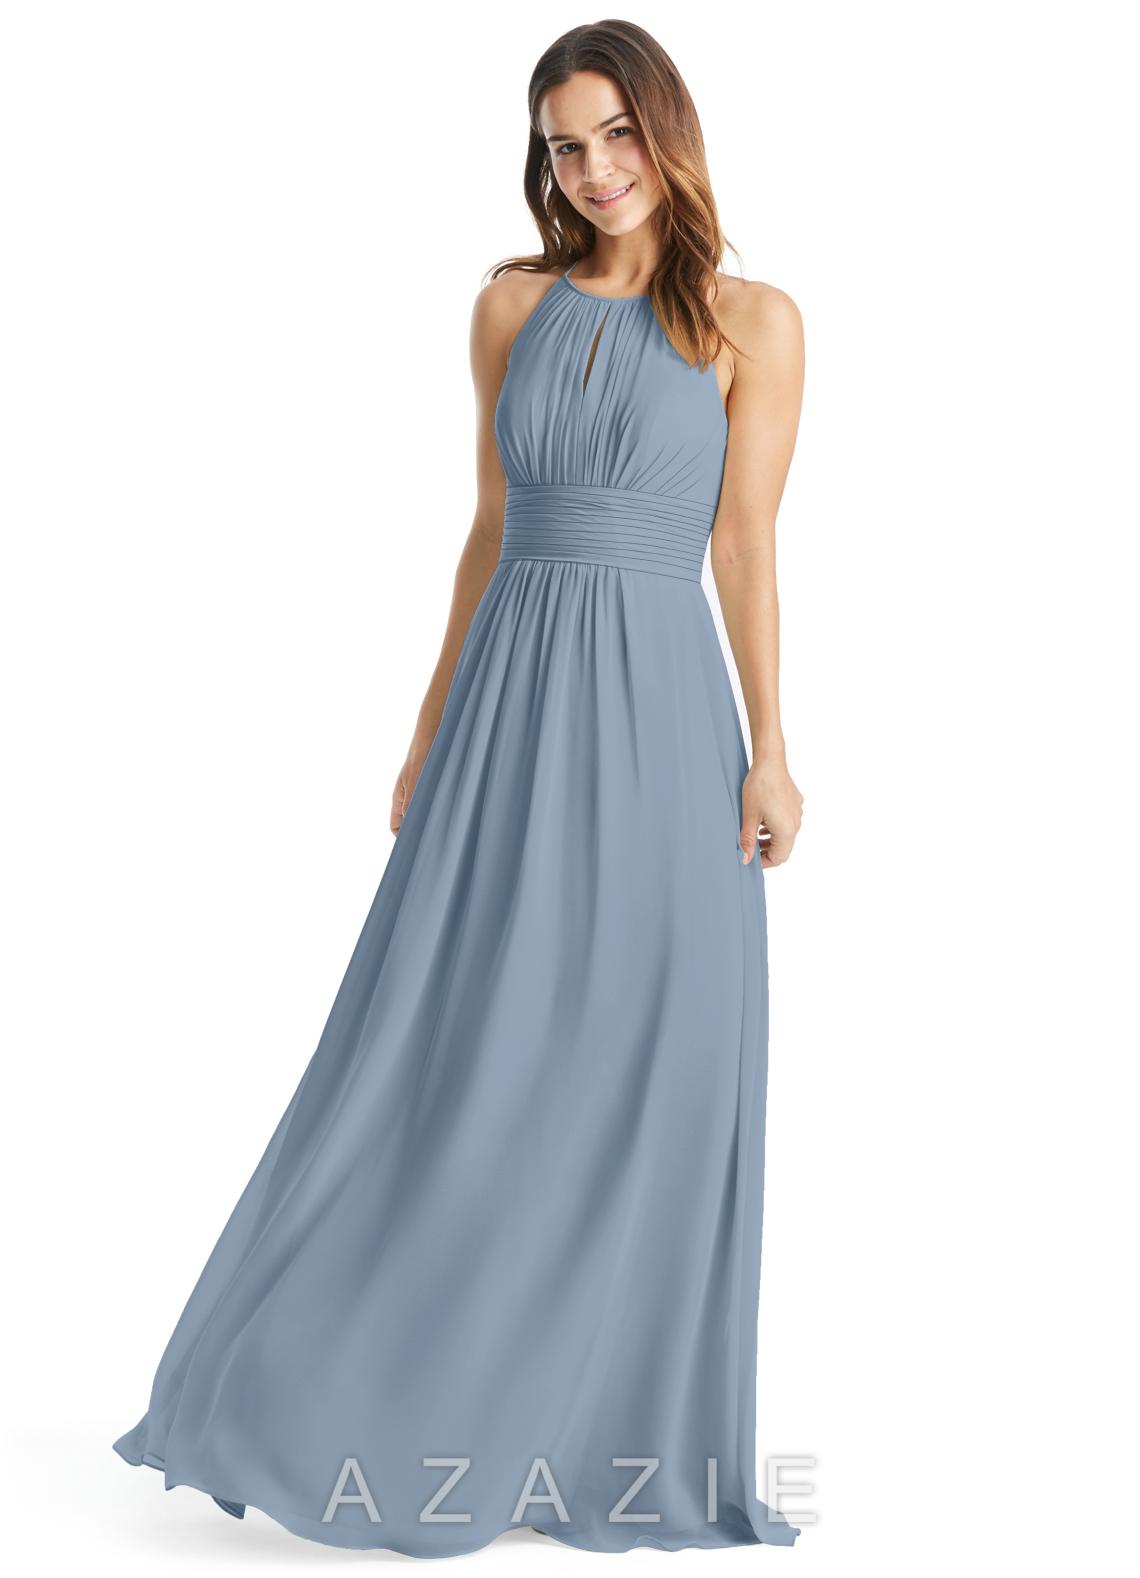 Azazie bonnie bridesmaid dress azazie loading zoom ombrellifo Choice Image